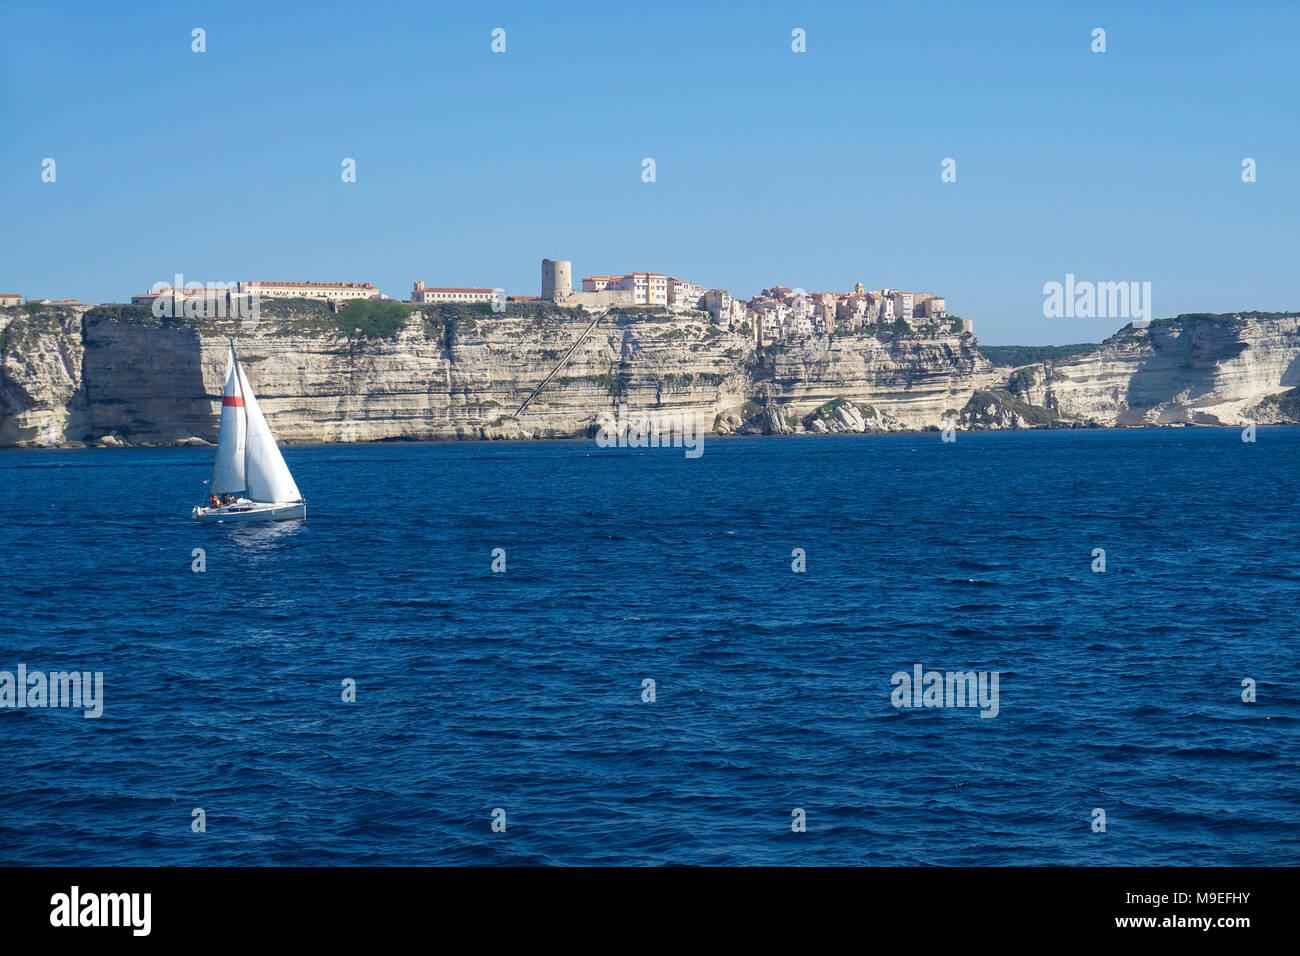 Sailing boat at Bonifacio, old historic harbour town built on a limestone cliff, Strait of Bonifacio, Corsica, France, Mediterranean, Europe - Stock Image